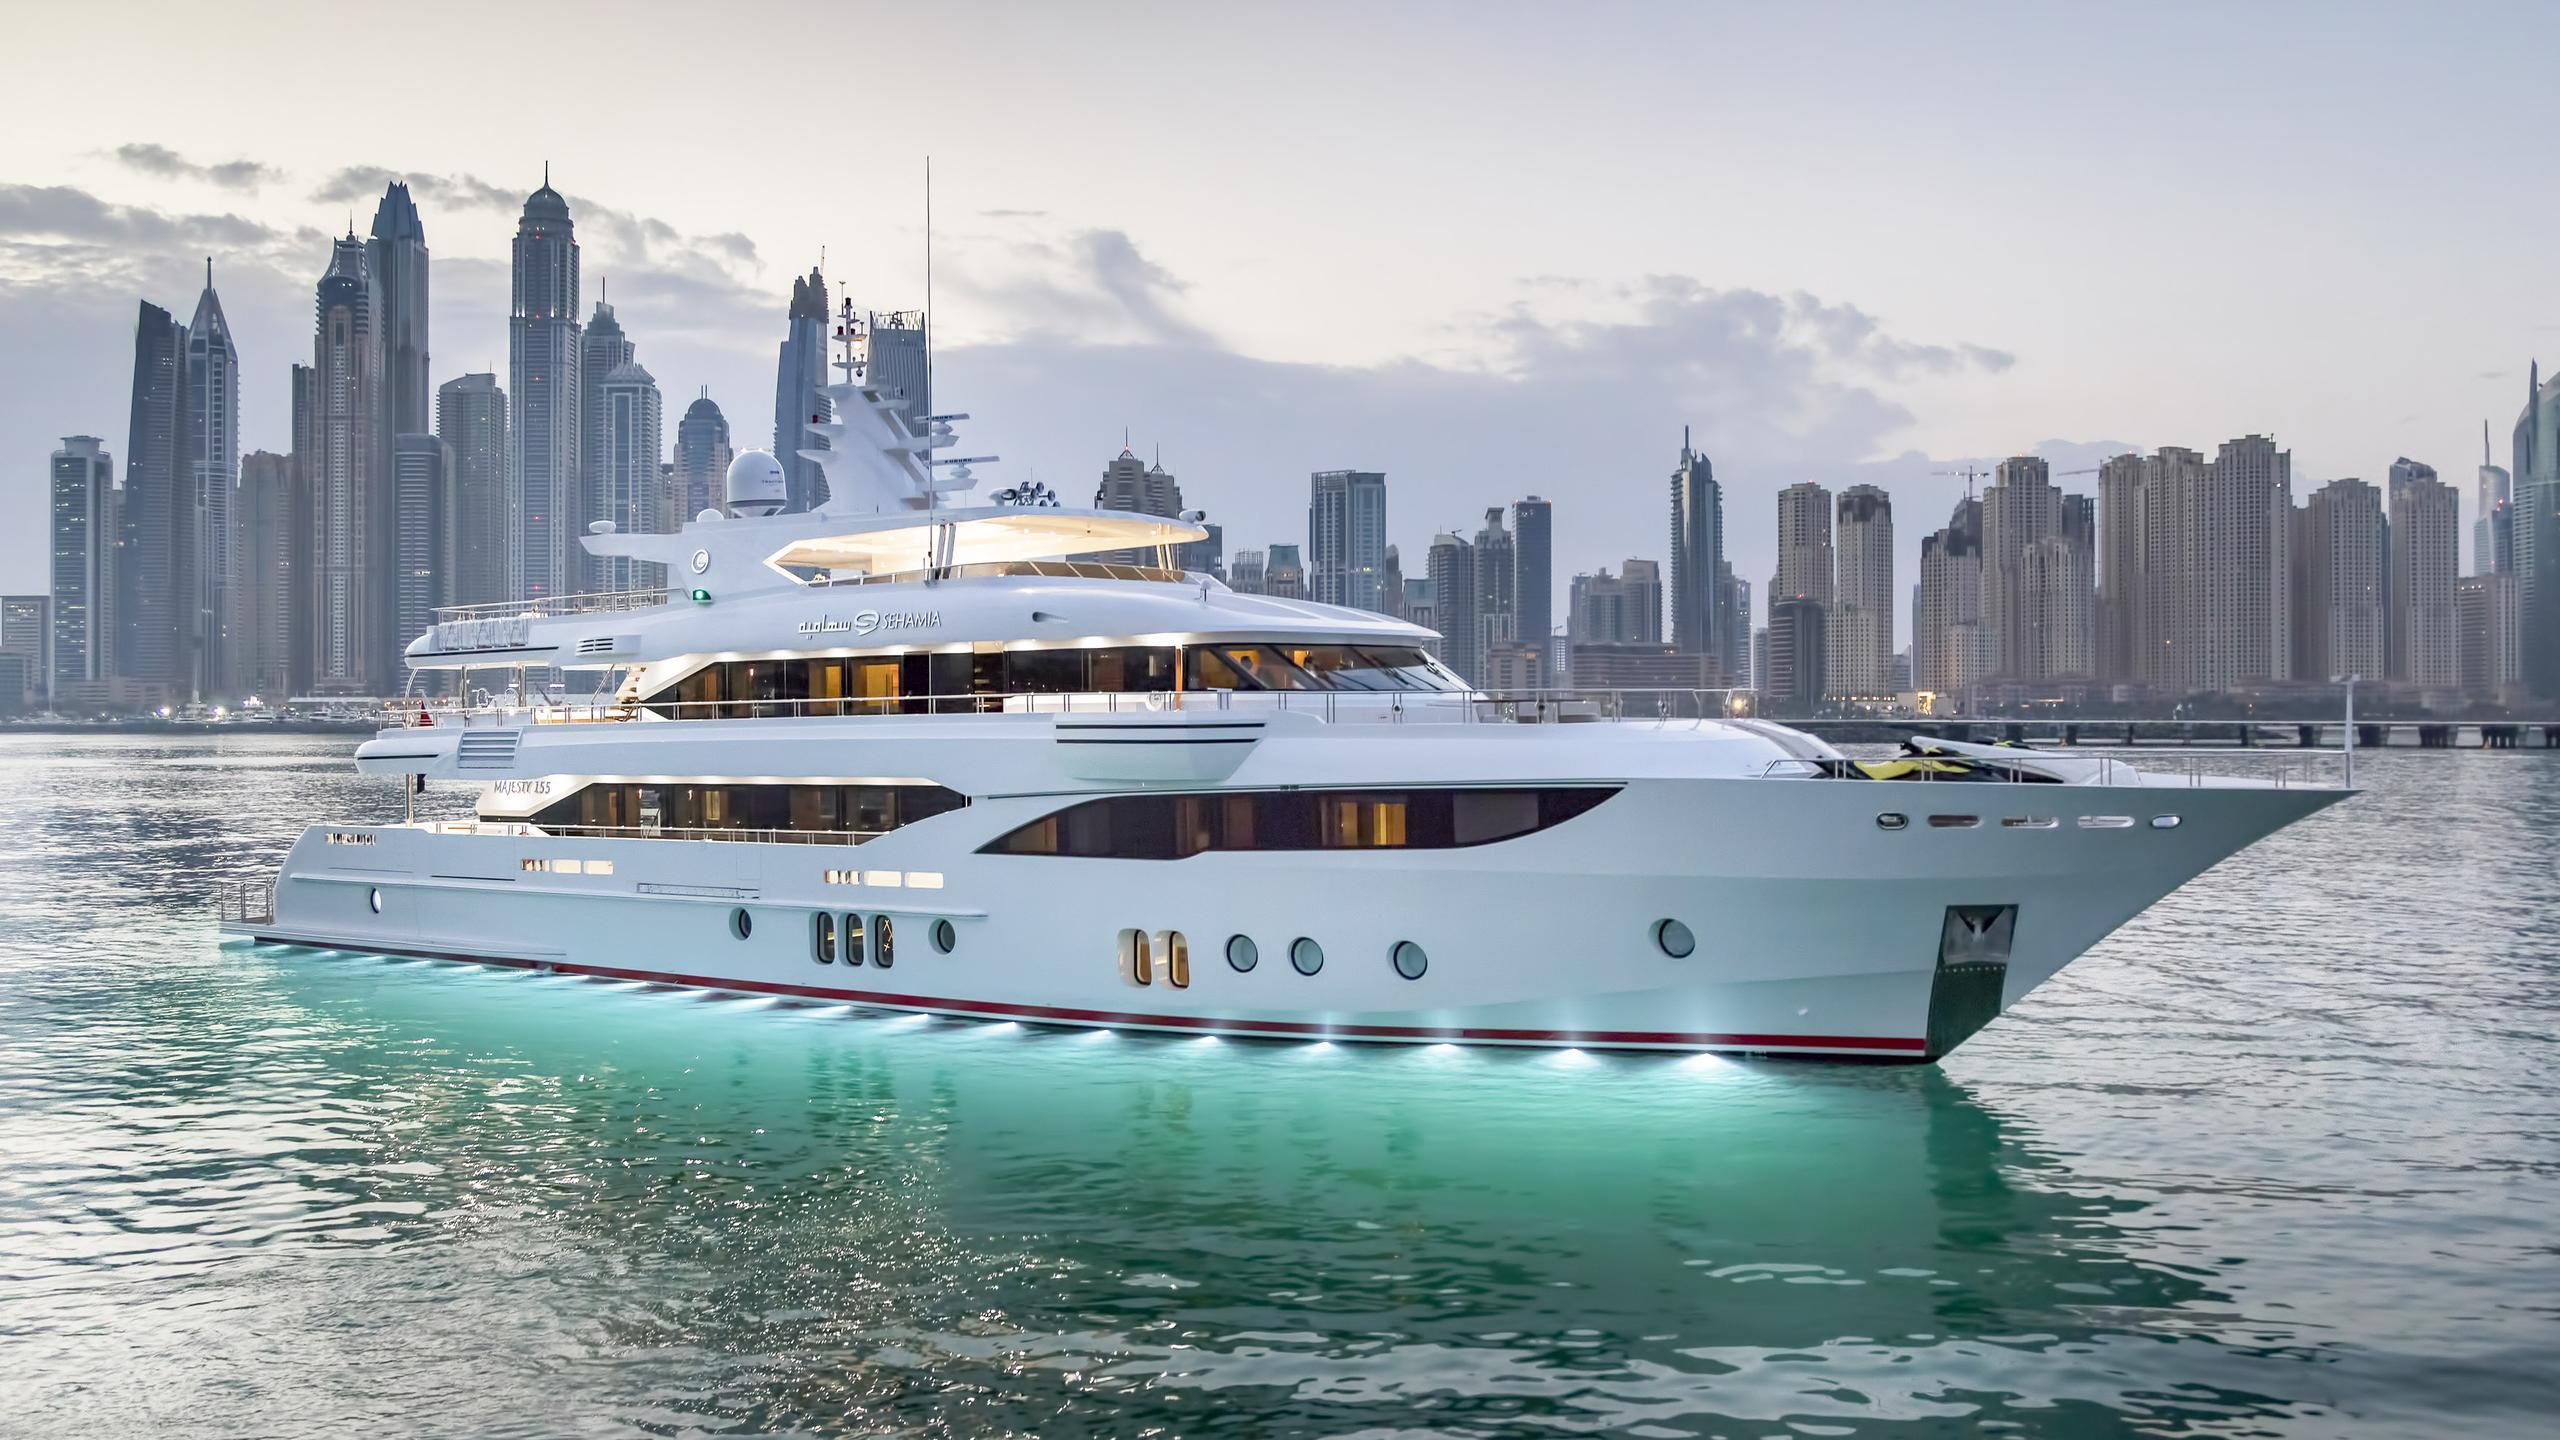 sehamia motoryacht gulf craft majesty 155 48m 2017 profile